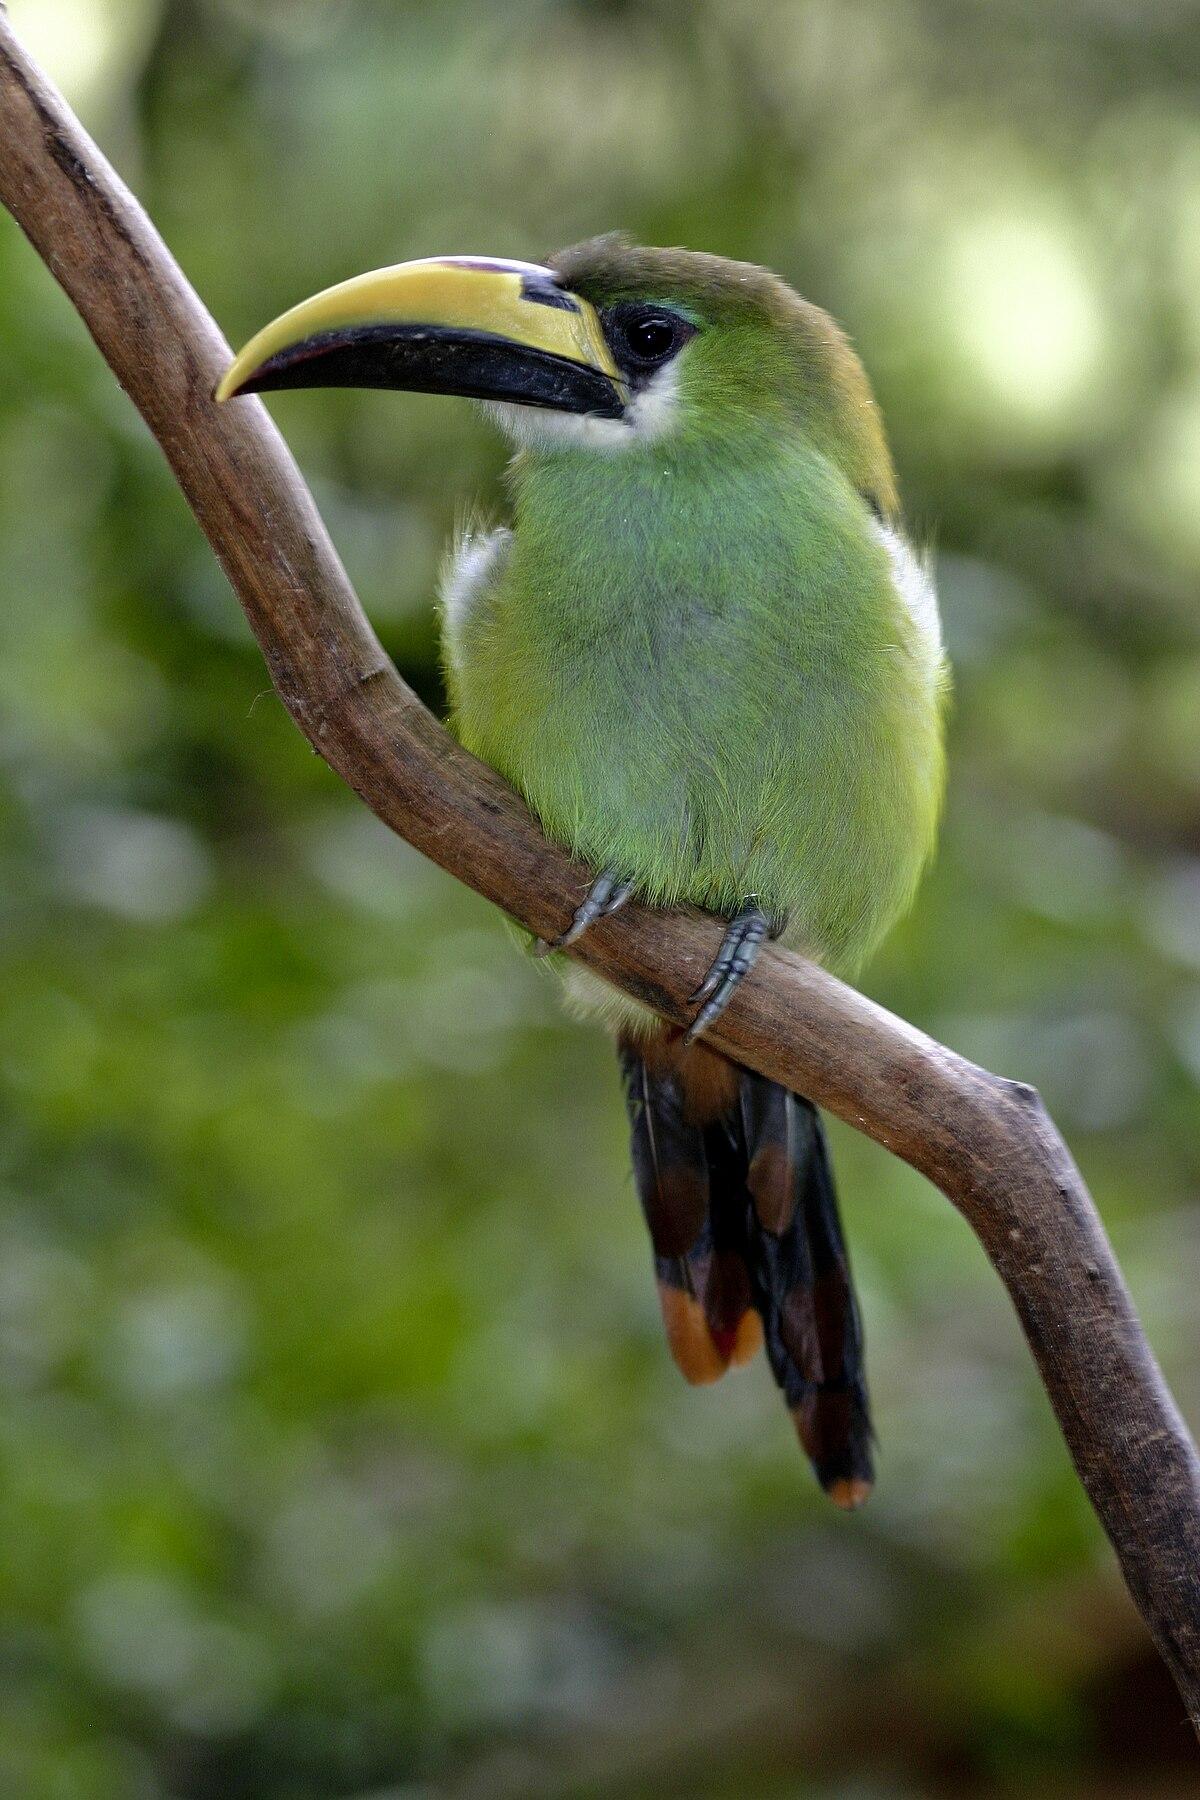 Emerald Toucanet Emerald toucanet - Wik...